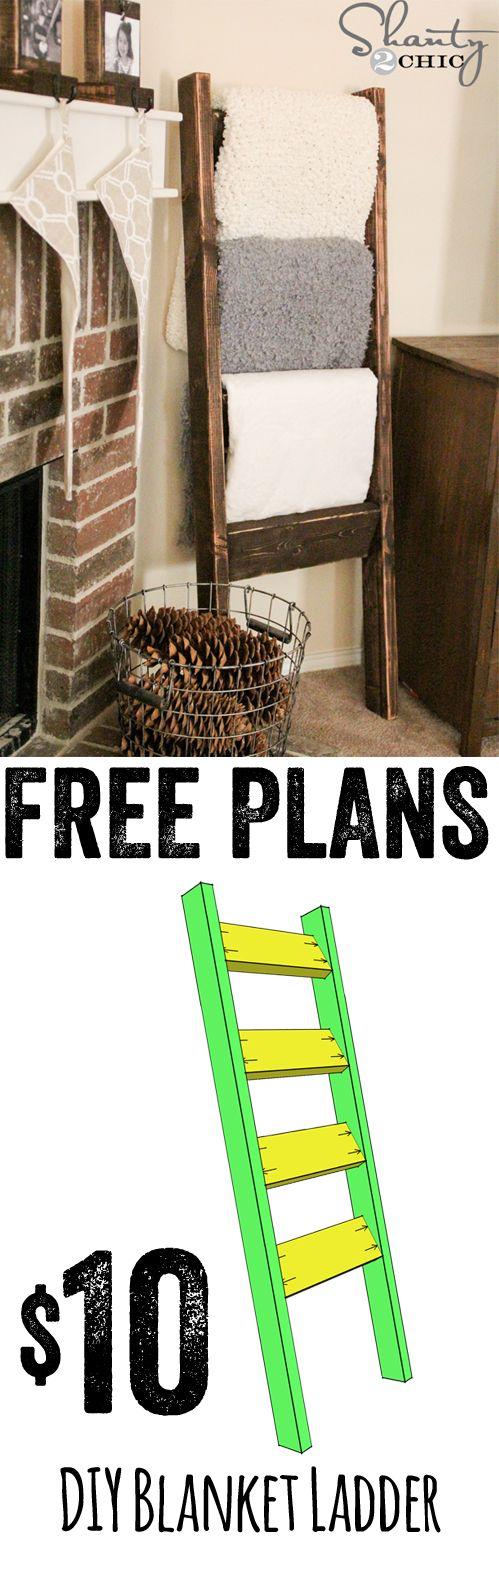 $10 Wooden Blanket Ladder - Shanty 2 Chic